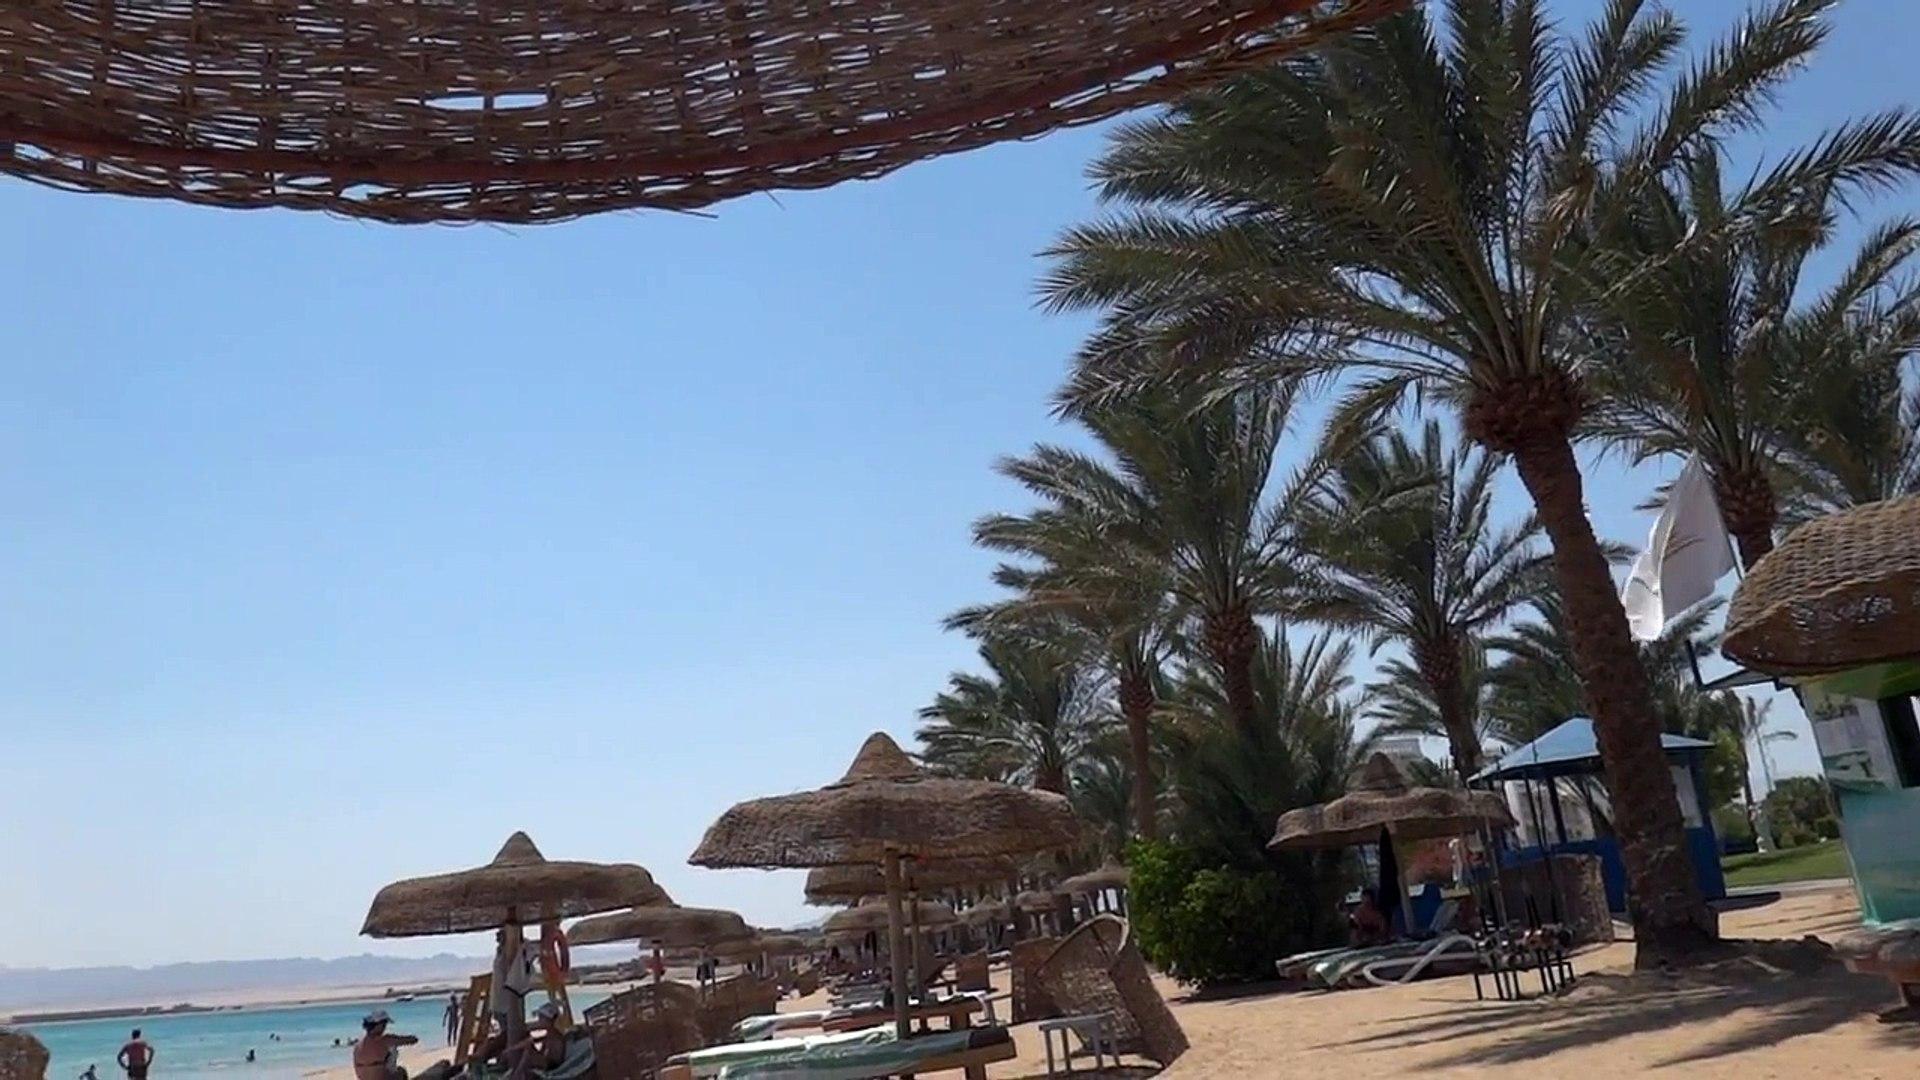 Пляж Otel Palm Royal De Lux HURGADA EGYPT 26/08/2012